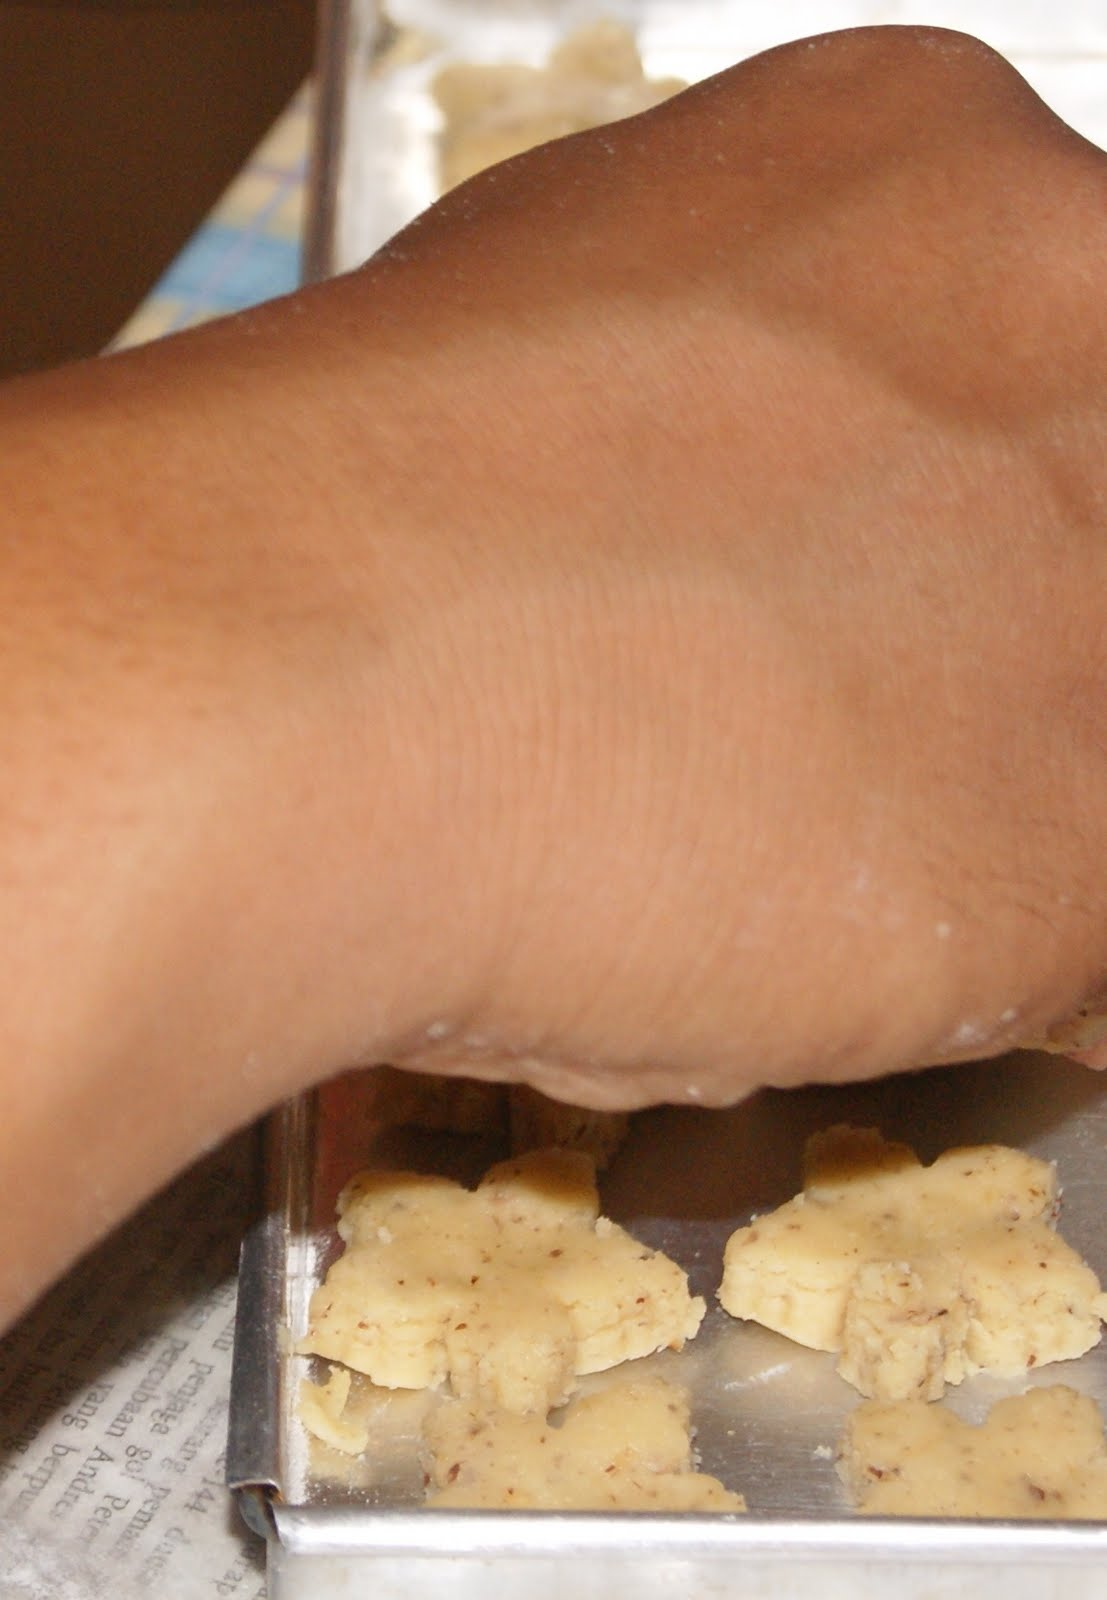 http://1.bp.blogspot.com/_mXnF8eZobxw/TT7ZsYznTvI/AAAAAAAAALY/p_wIaTfnstE/s1600/hazel%2Bnut%2Bcookies%2B2.jpg